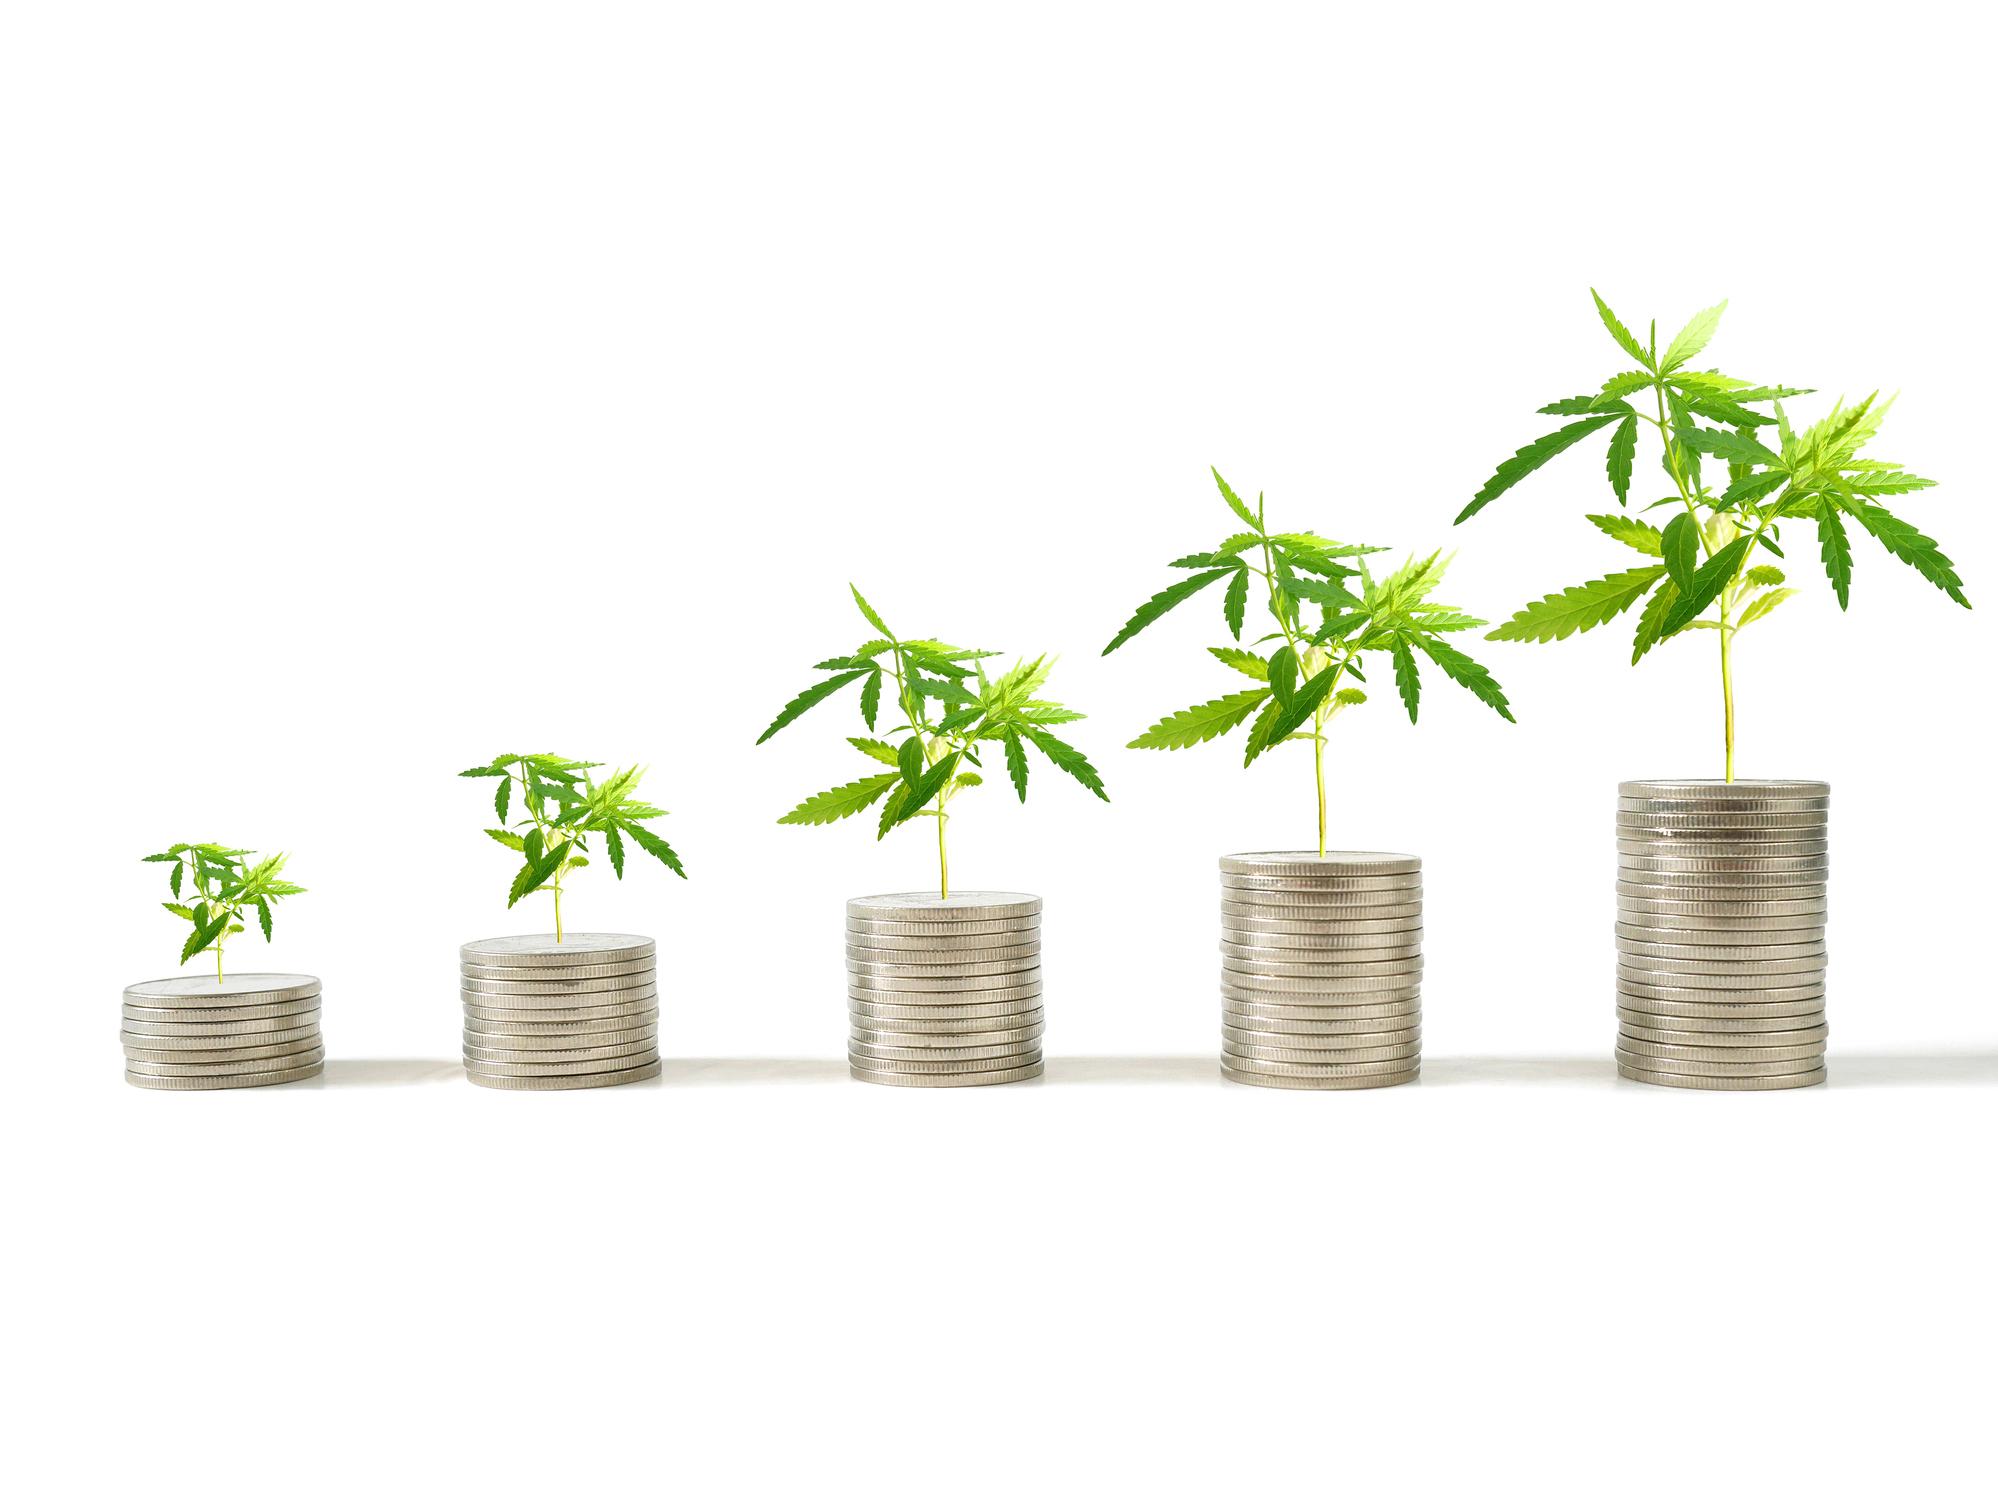 3 Small-Cap Marijuana Stocks That Could Be Humongous Winners